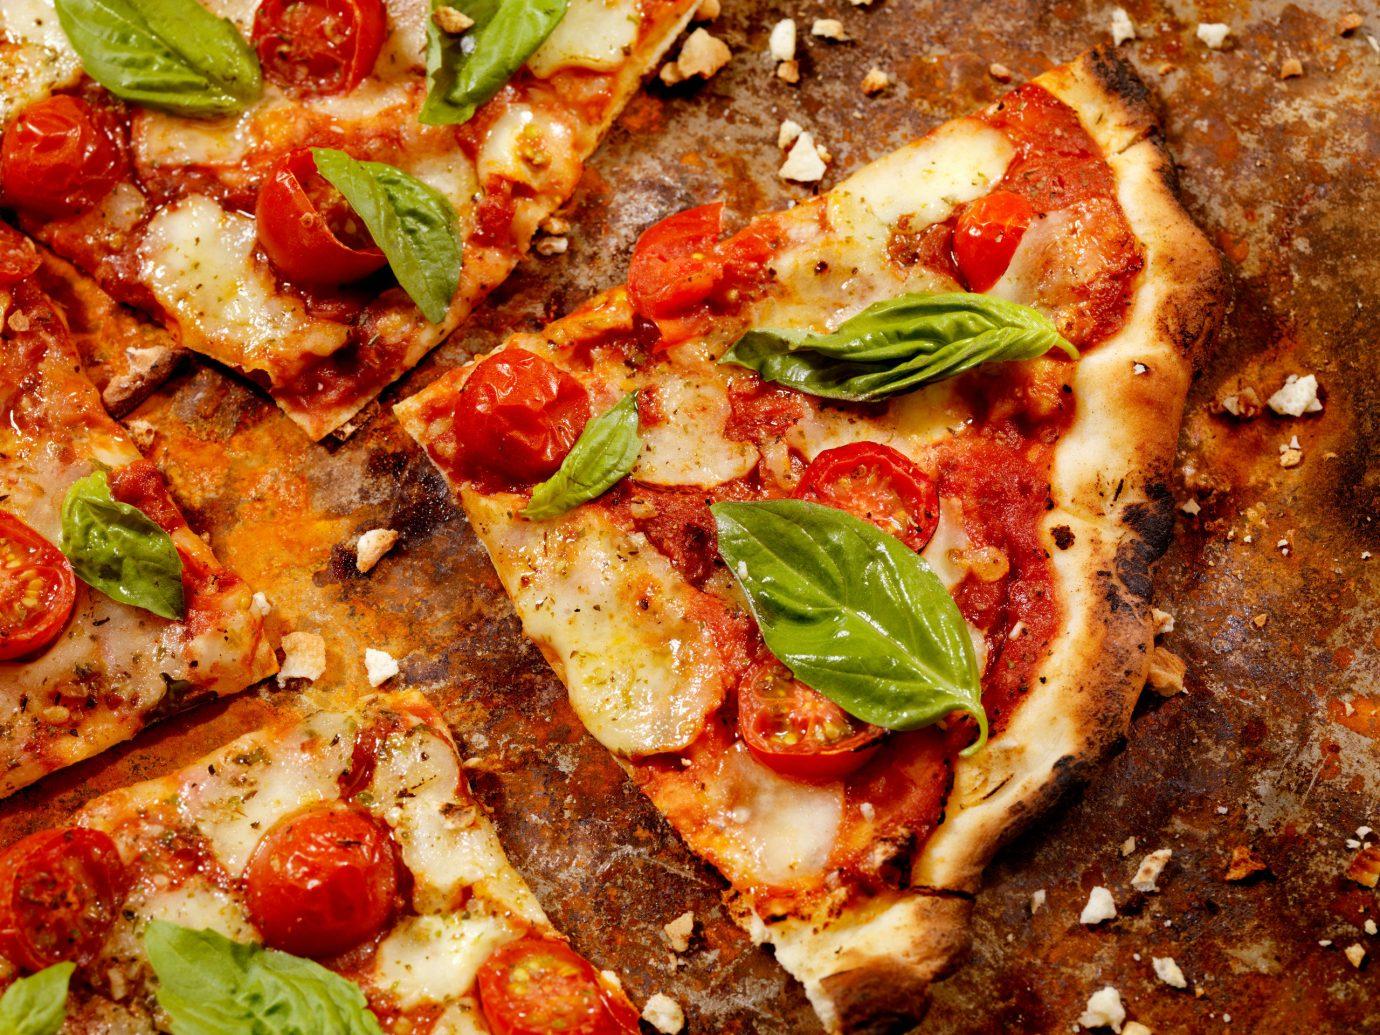 Trip Ideas pizza food dish cuisine meat italian food produce european food vegetable toppings sliced fresh